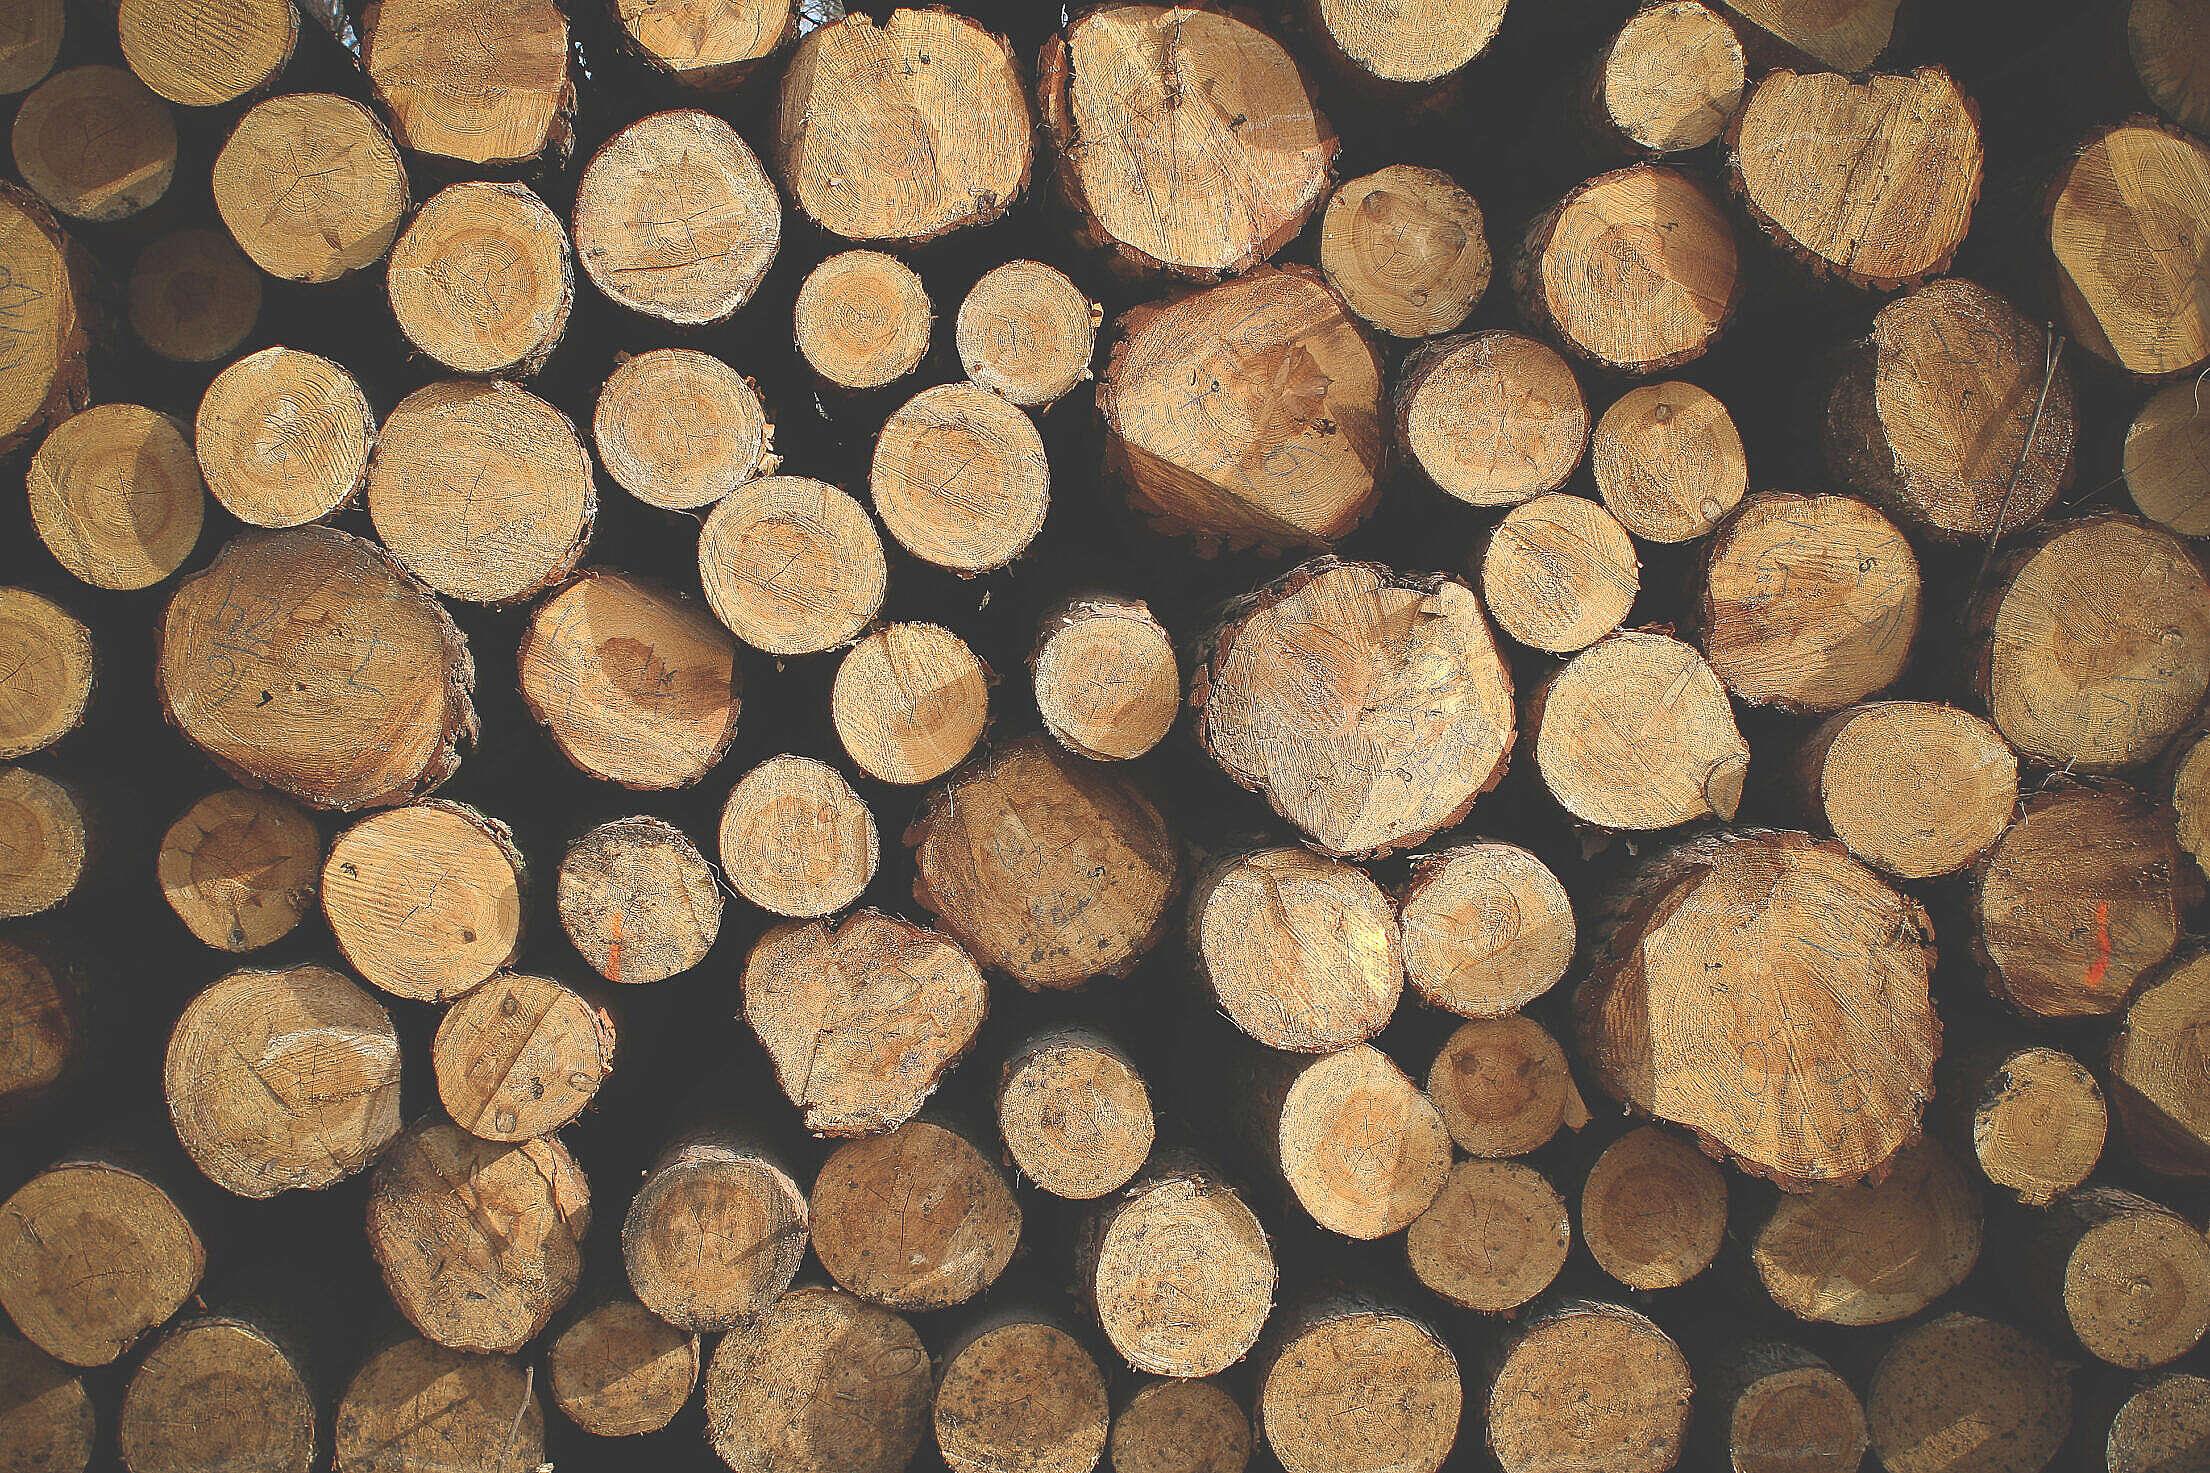 Pile of Wood Free Stock Photo